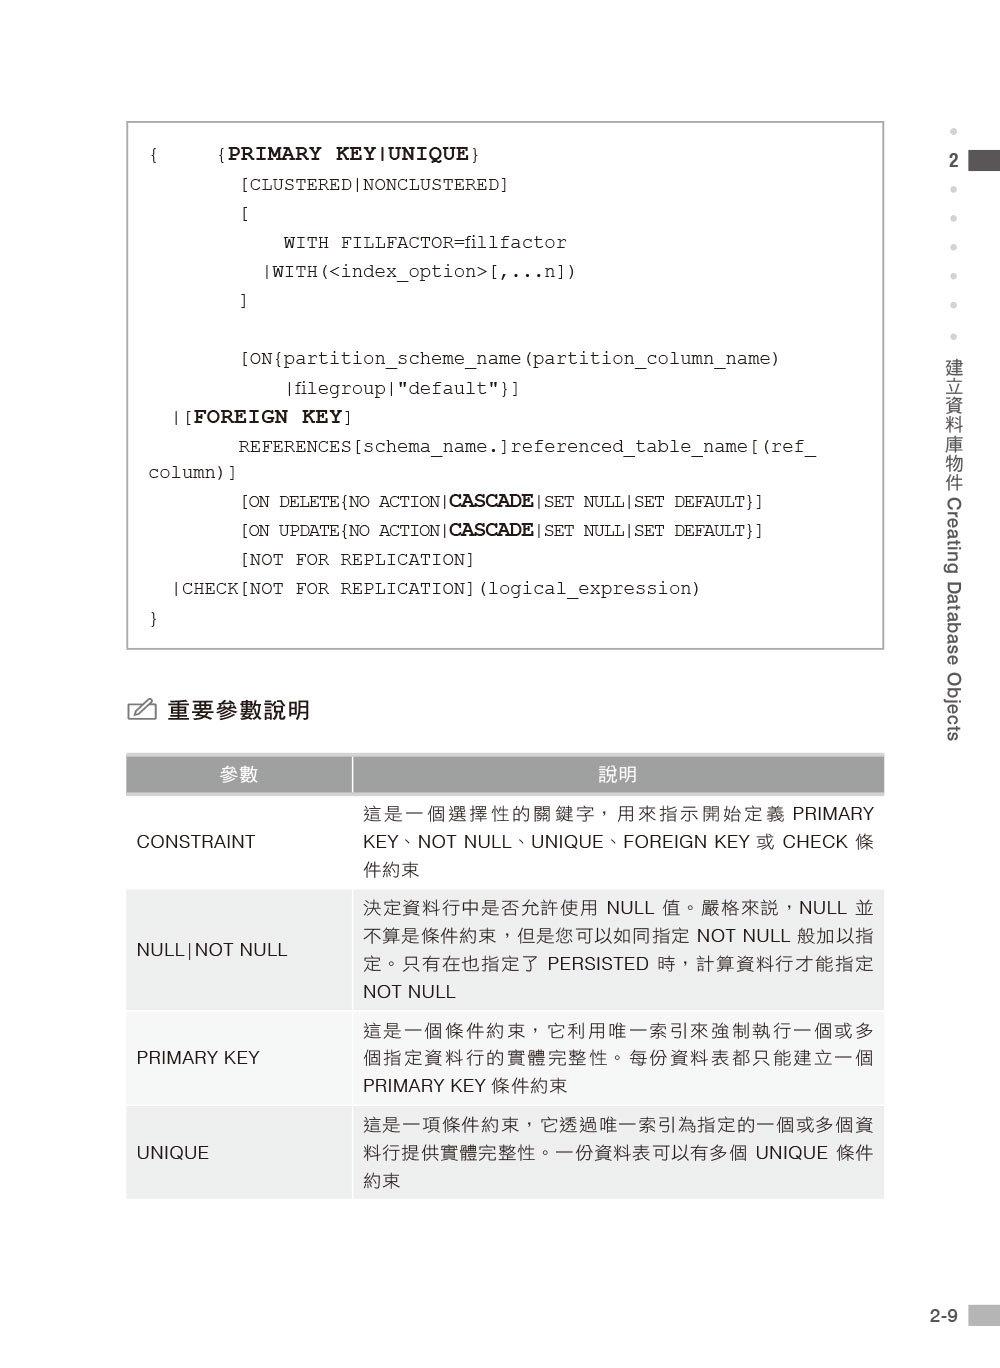 MTA Database Fundamentals 資料庫管理 國際認證教戰手冊 (98-364)-preview-11